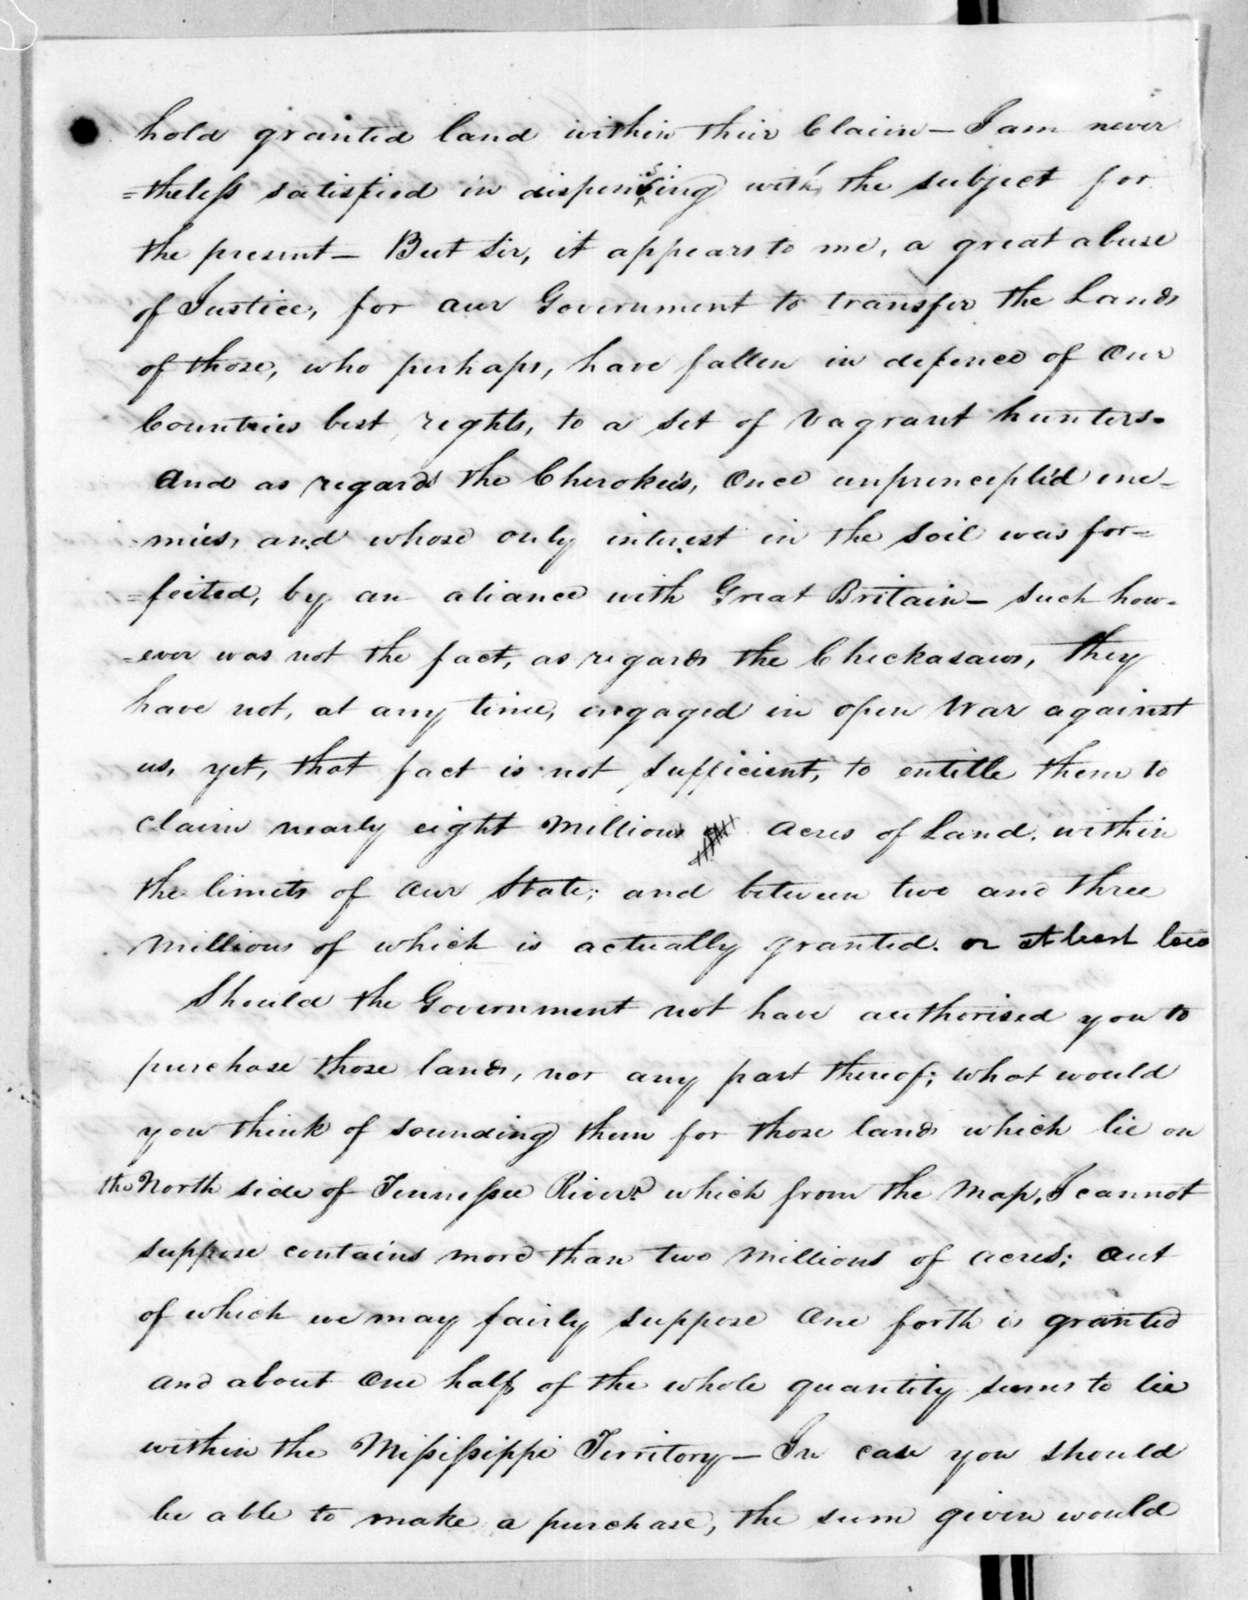 Joseph McMinn to Andrew Jackson, August 30, 1816